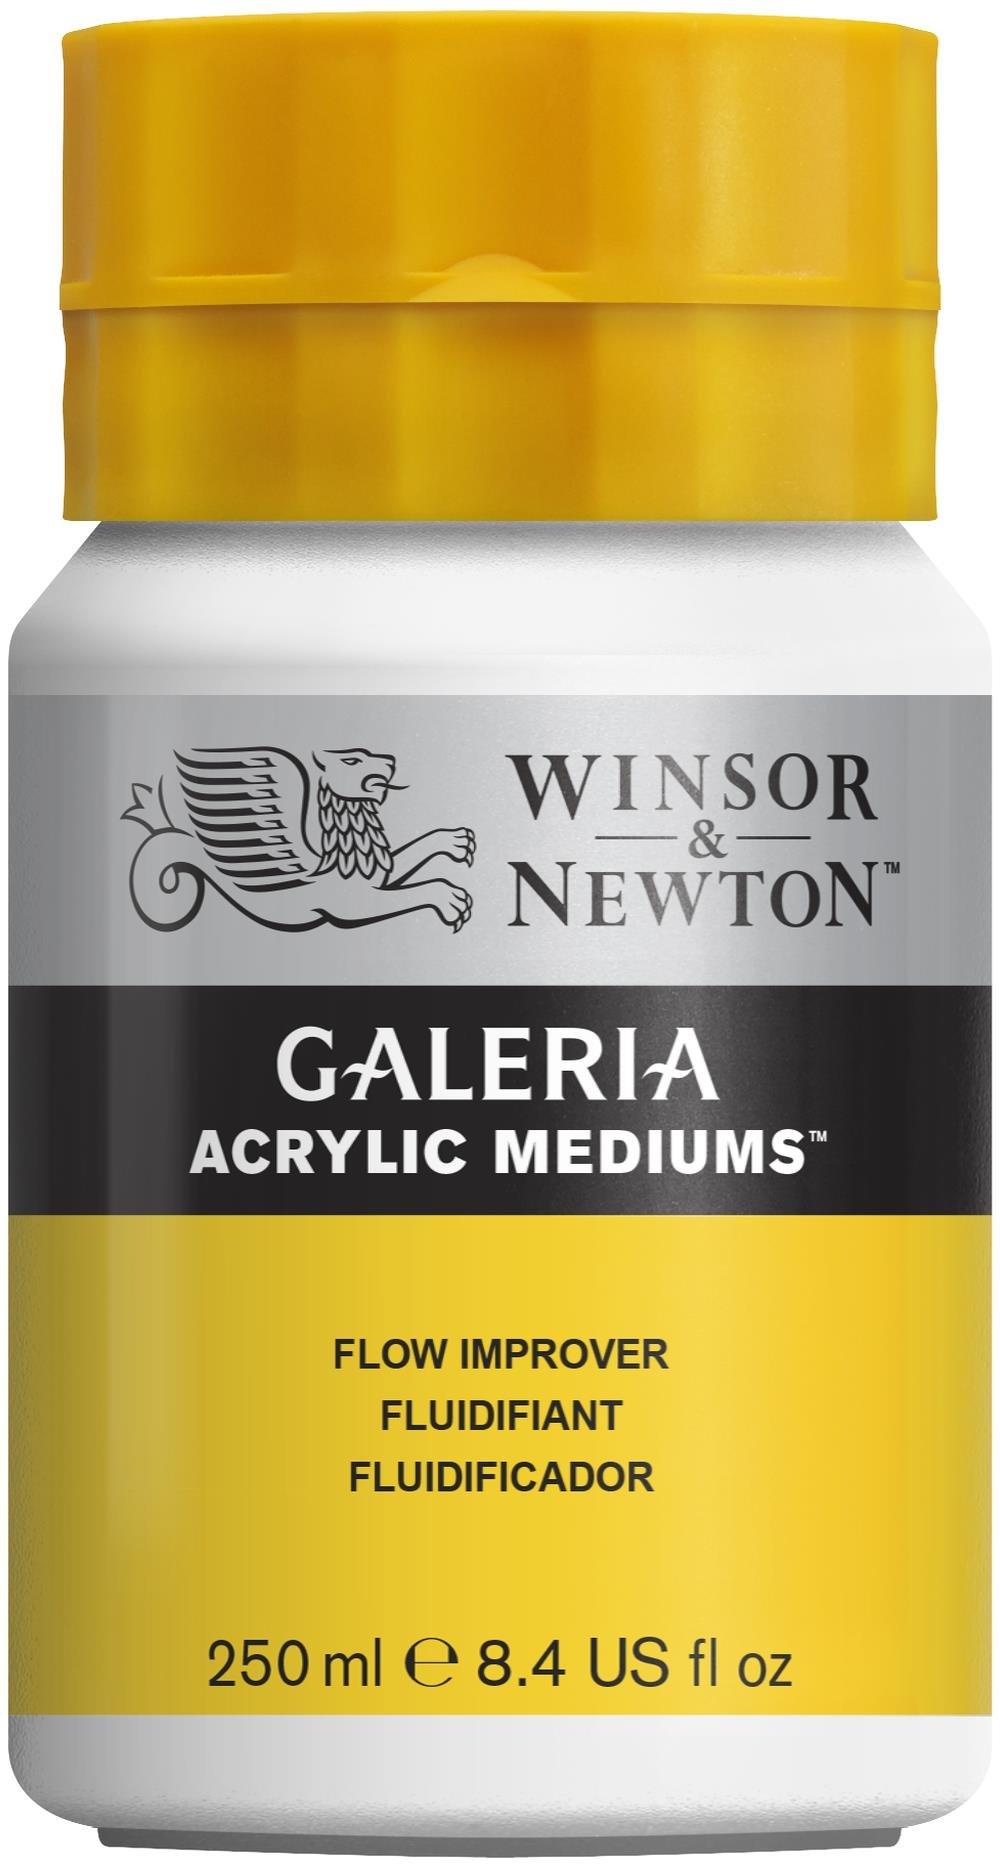 Winsor & Newton Galeria Acrylic Medium Flow